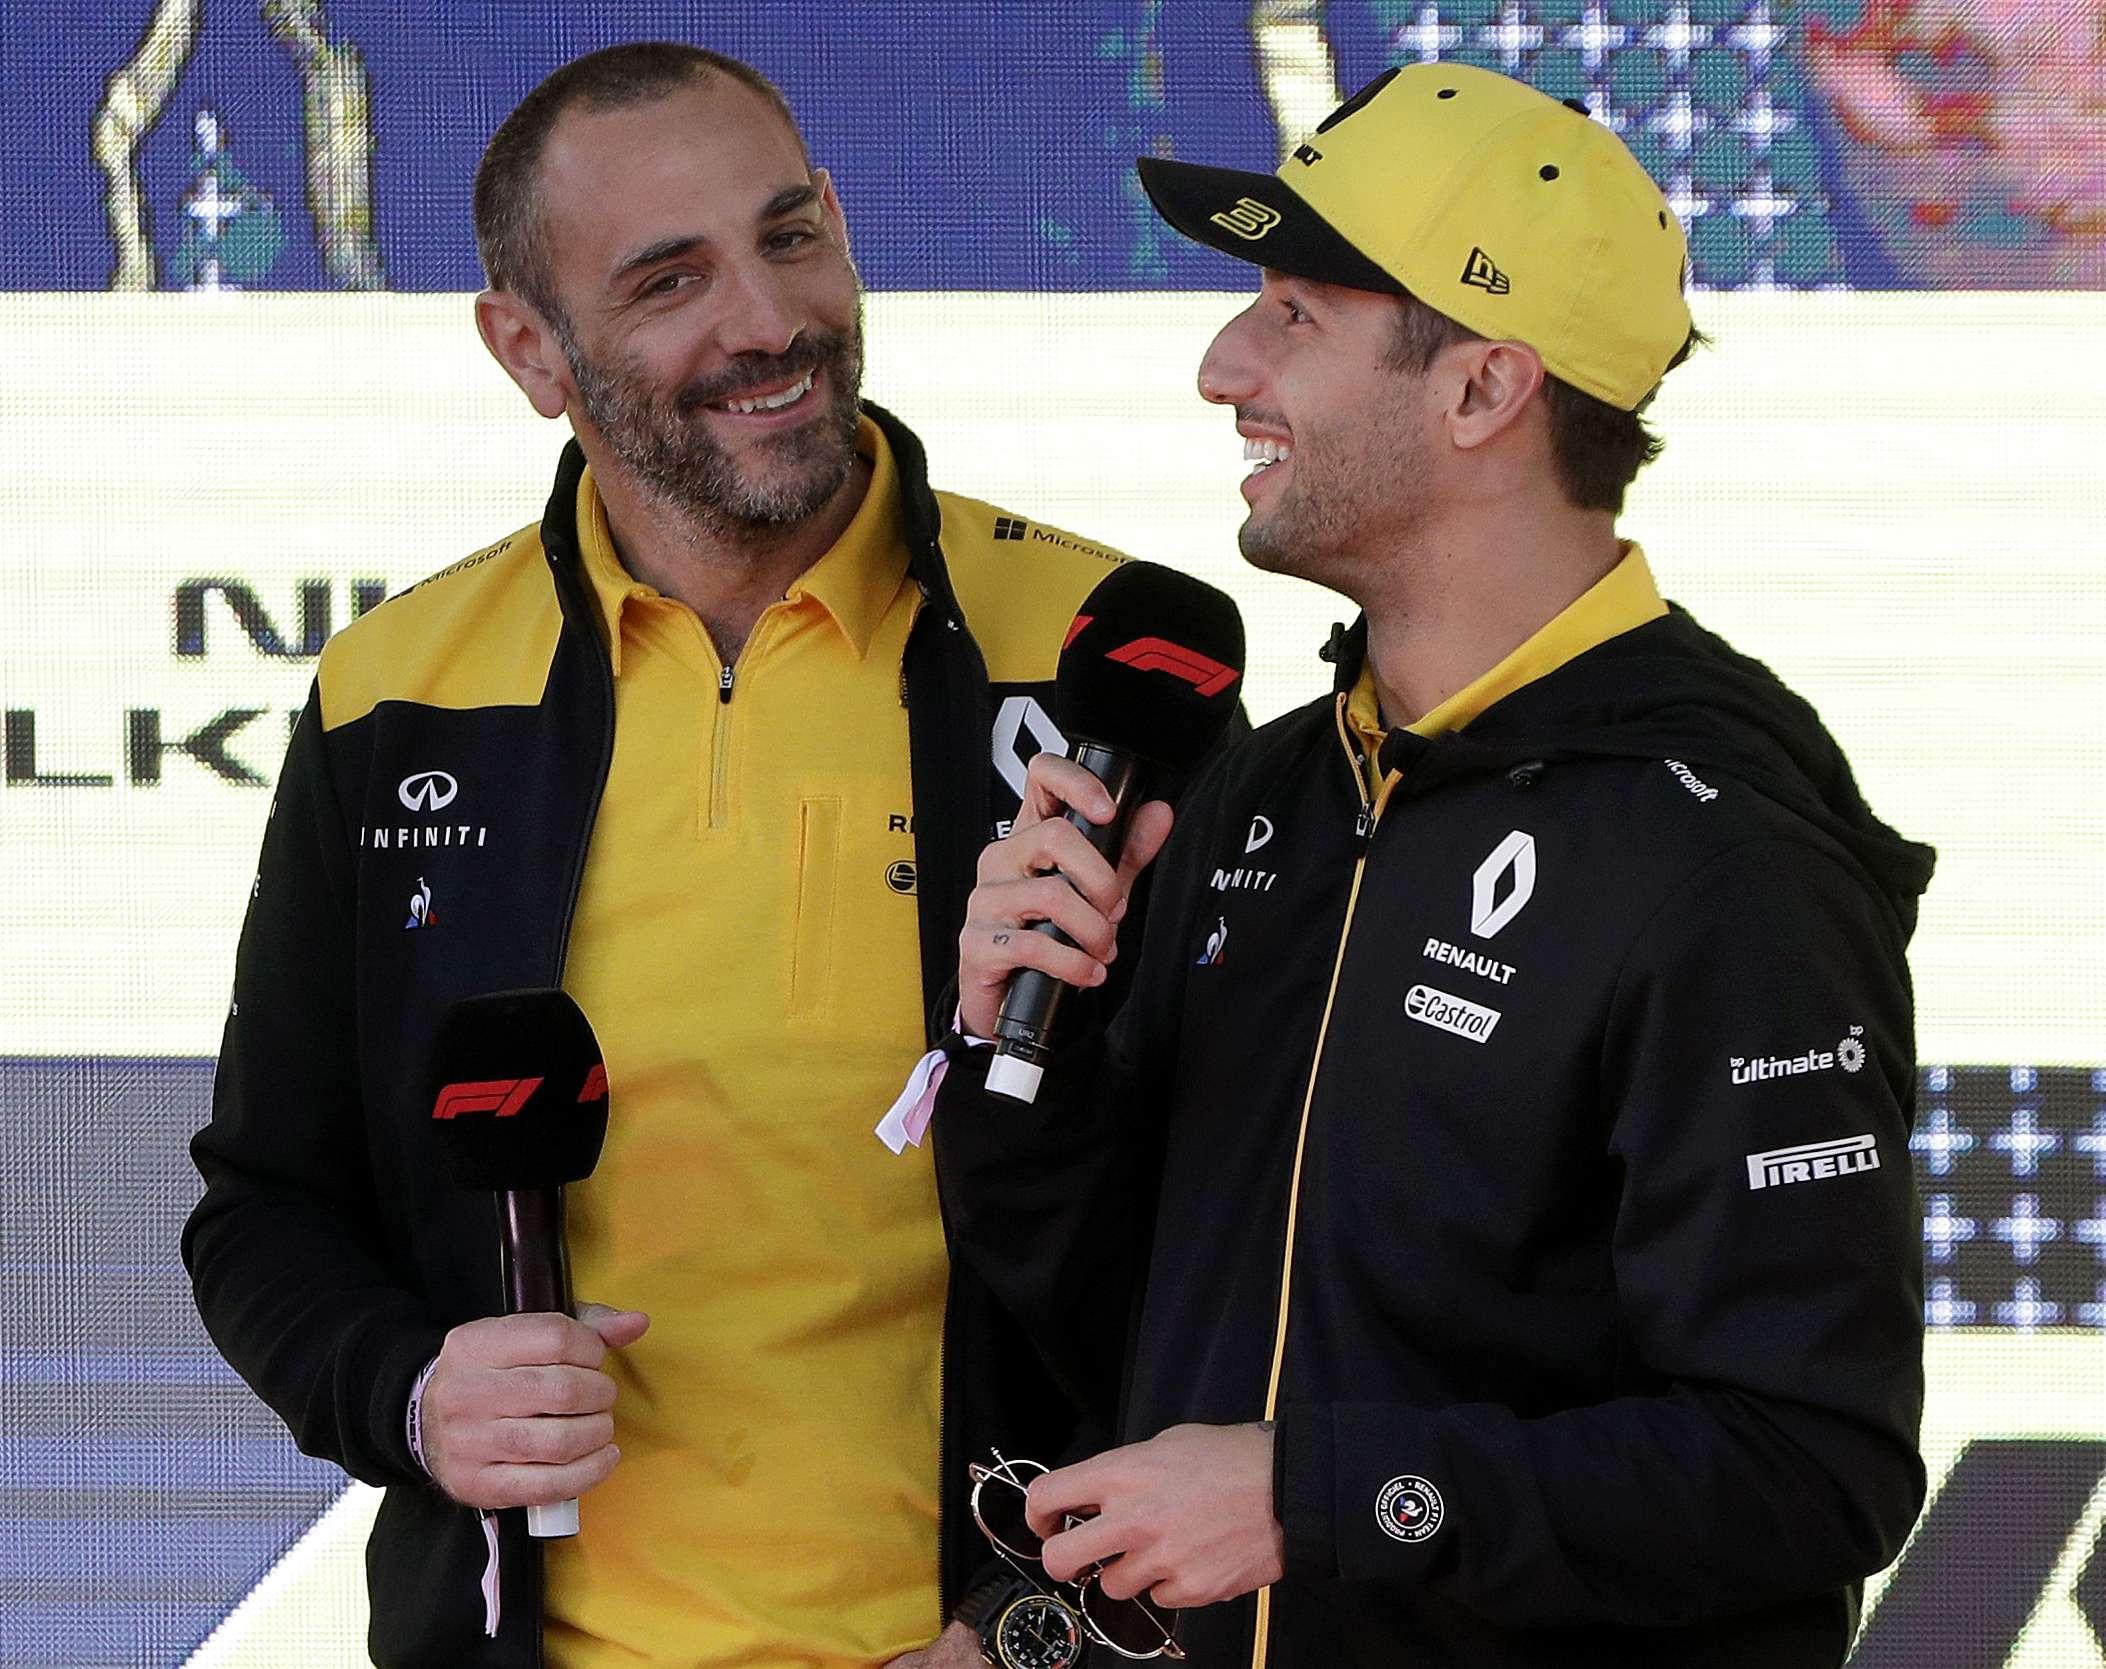 Ricciardo no pierde lealtad australiana tras pasar a Renault